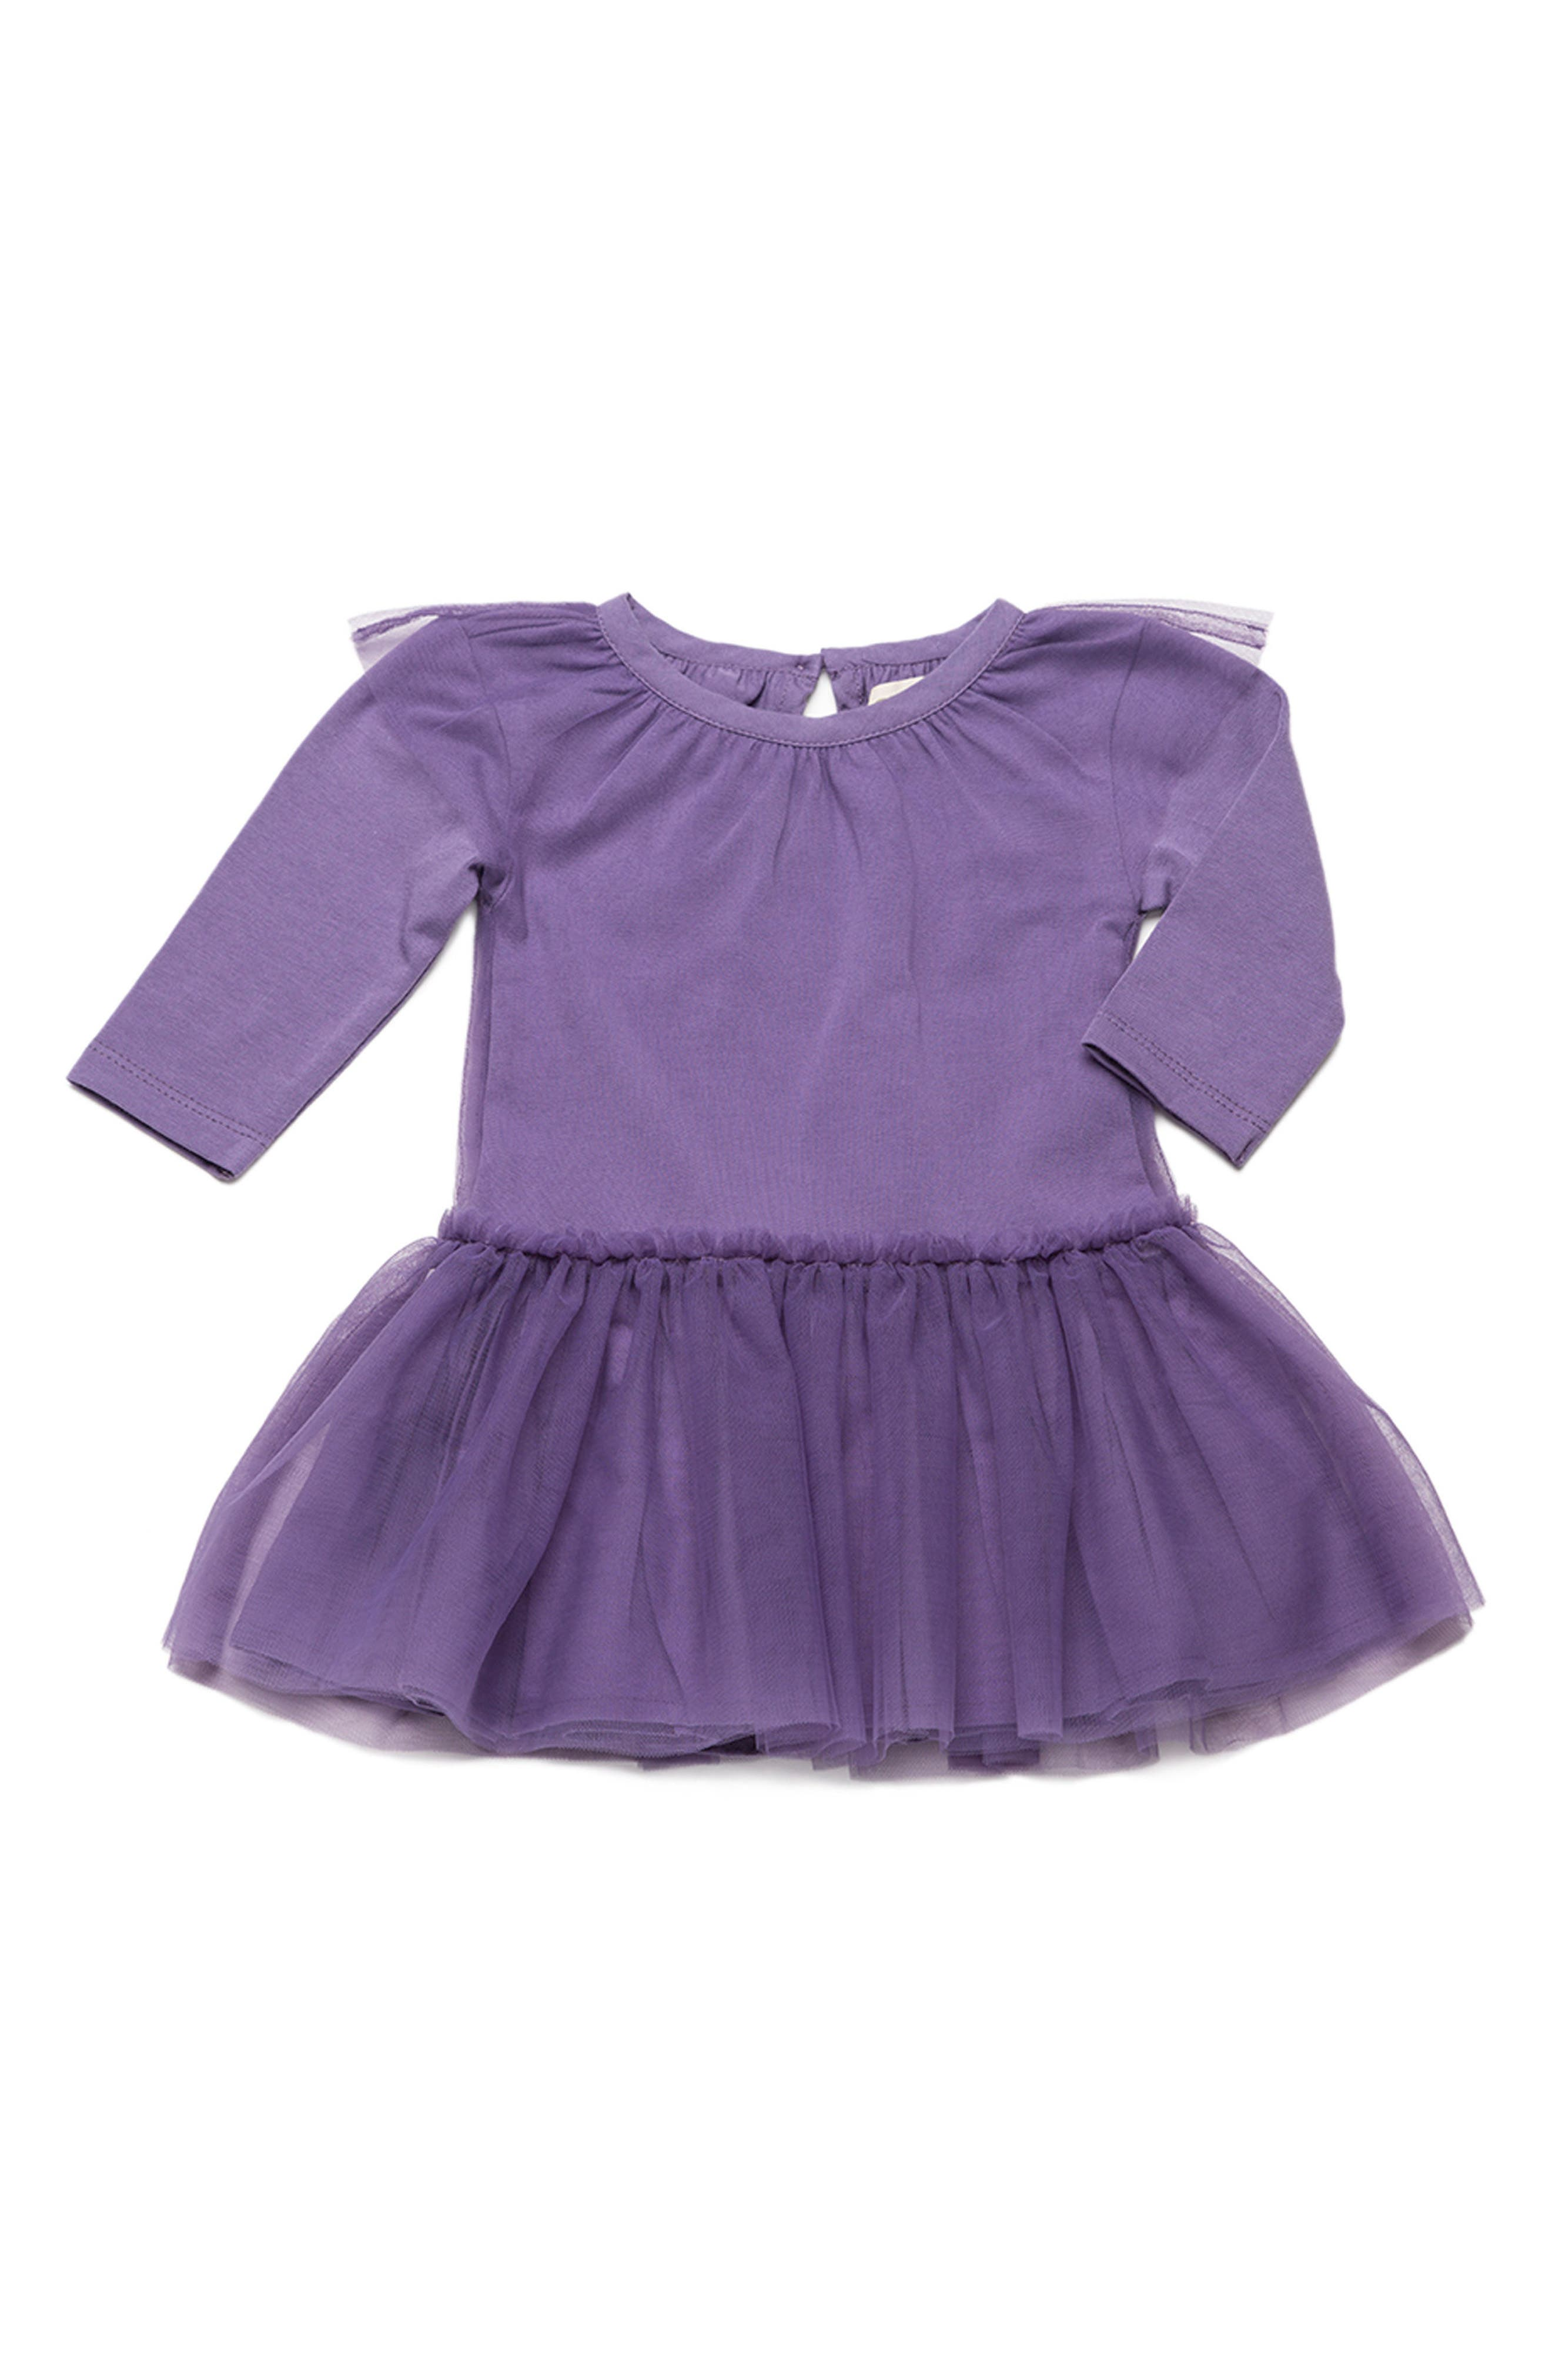 Little Belle Tulle Dress,                             Main thumbnail 1, color,                             Dark Purple